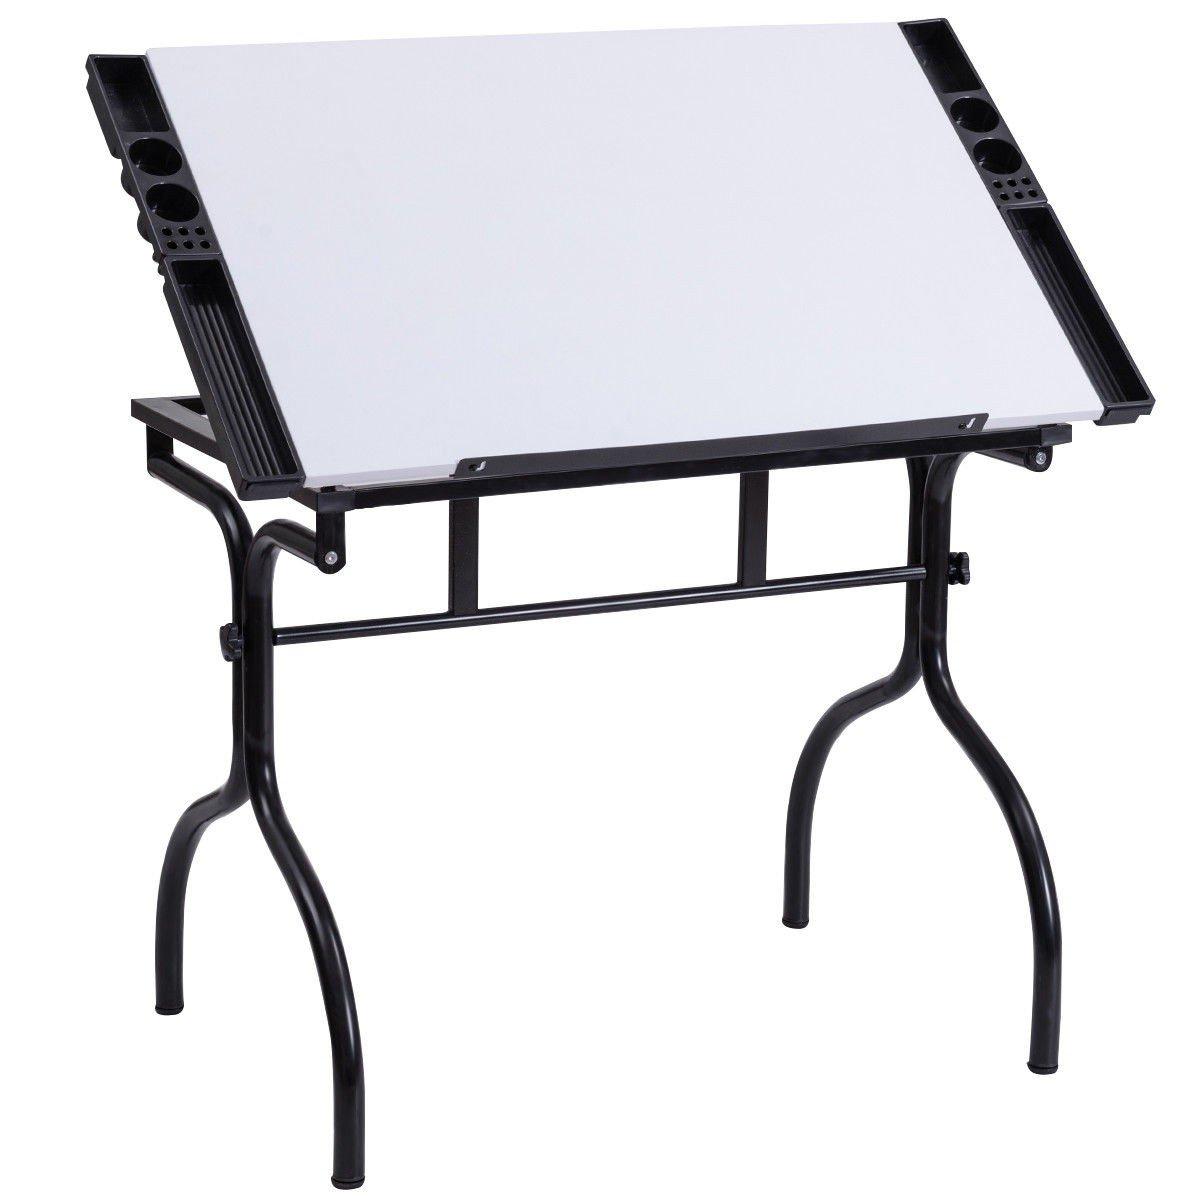 Custpromo Adjustable Drafting Table Art & Craft Drawing Desk Folding Drafting Desk